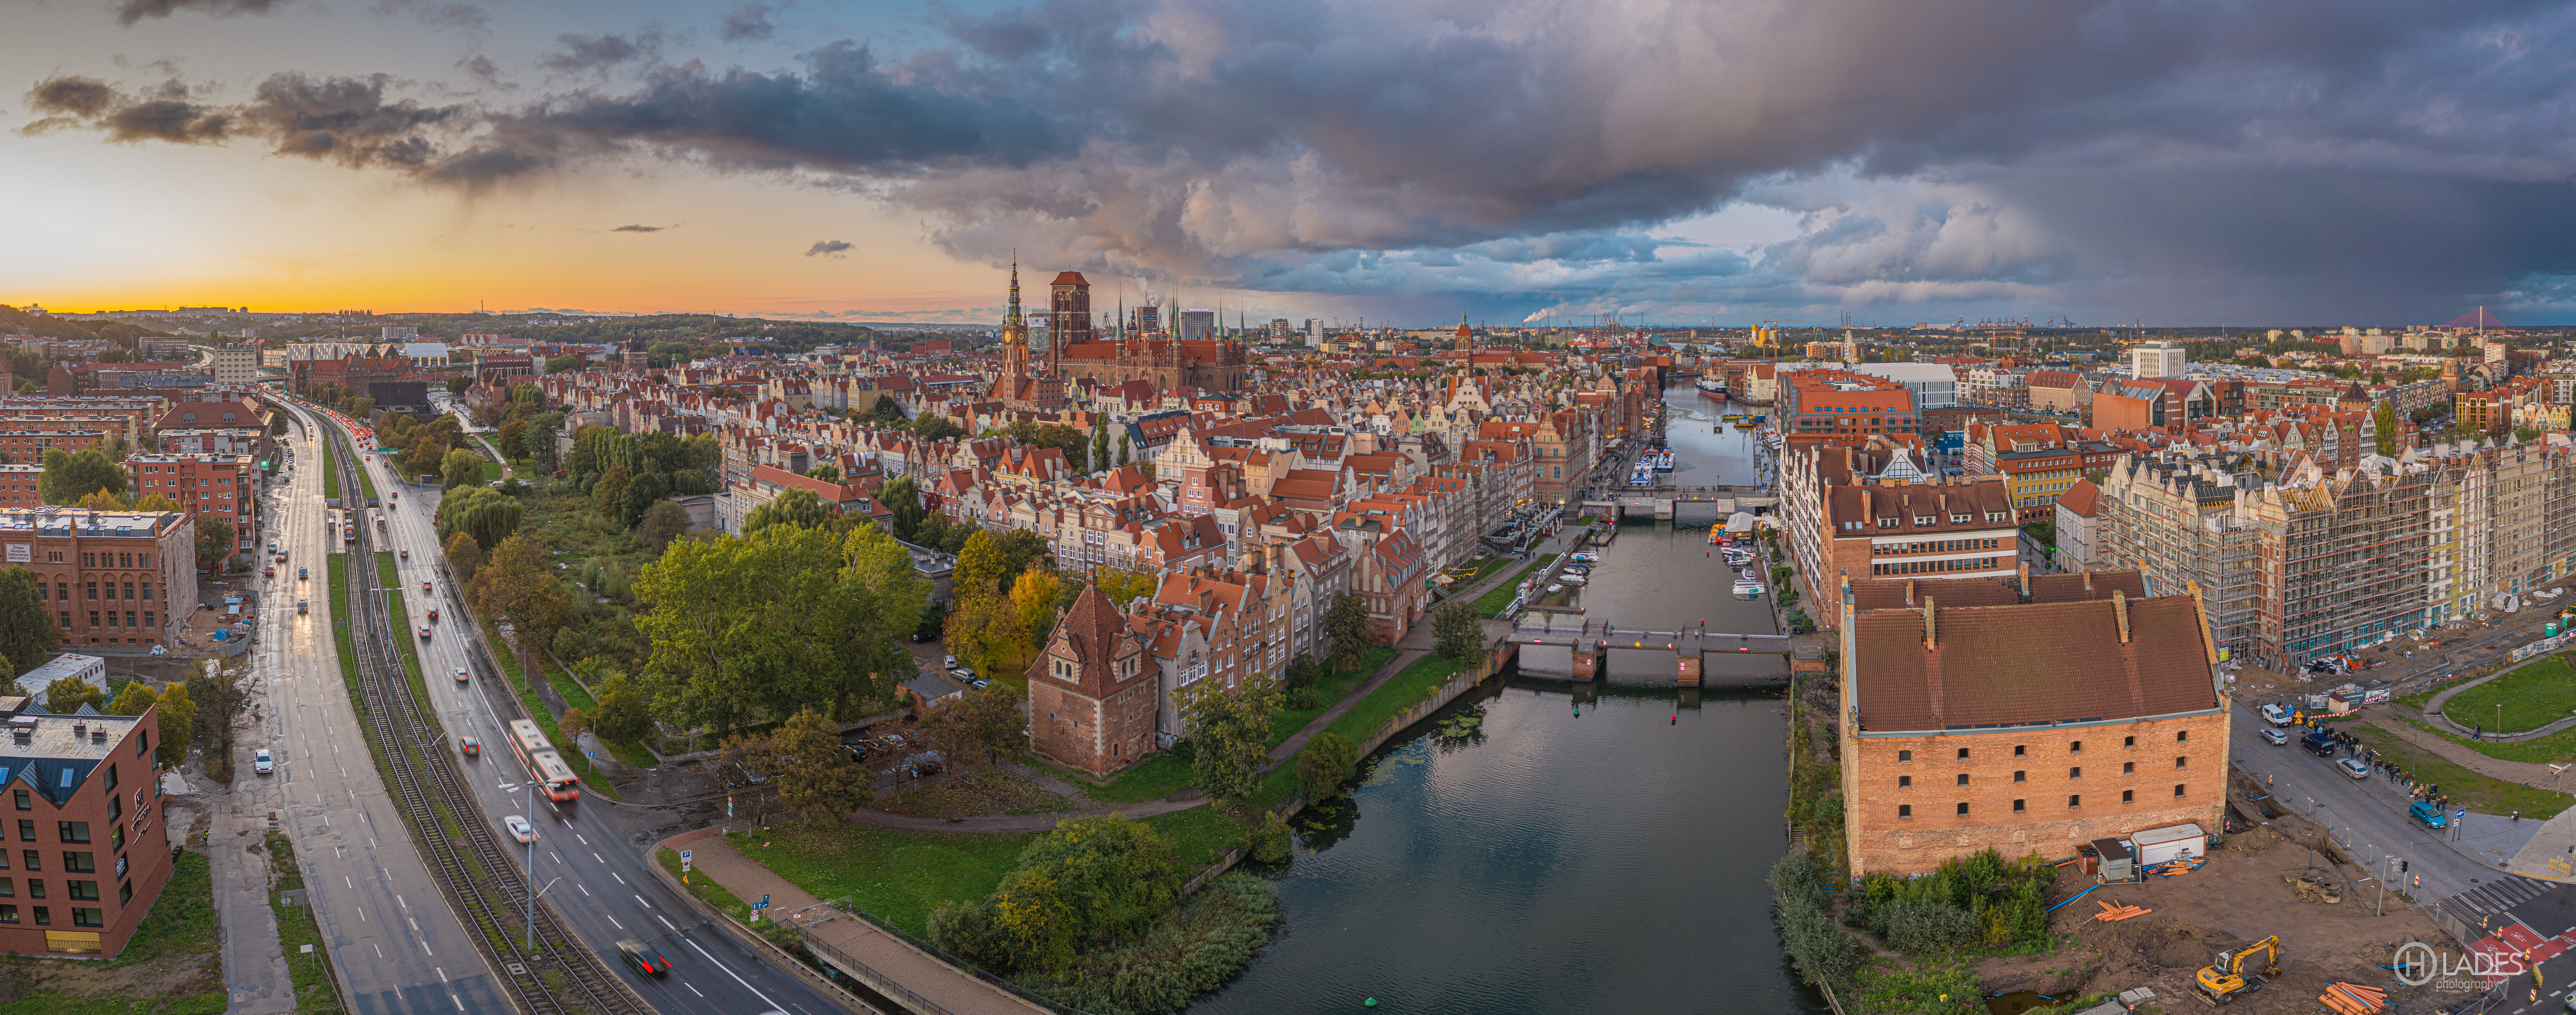 Gdańsk - Jesień 2019